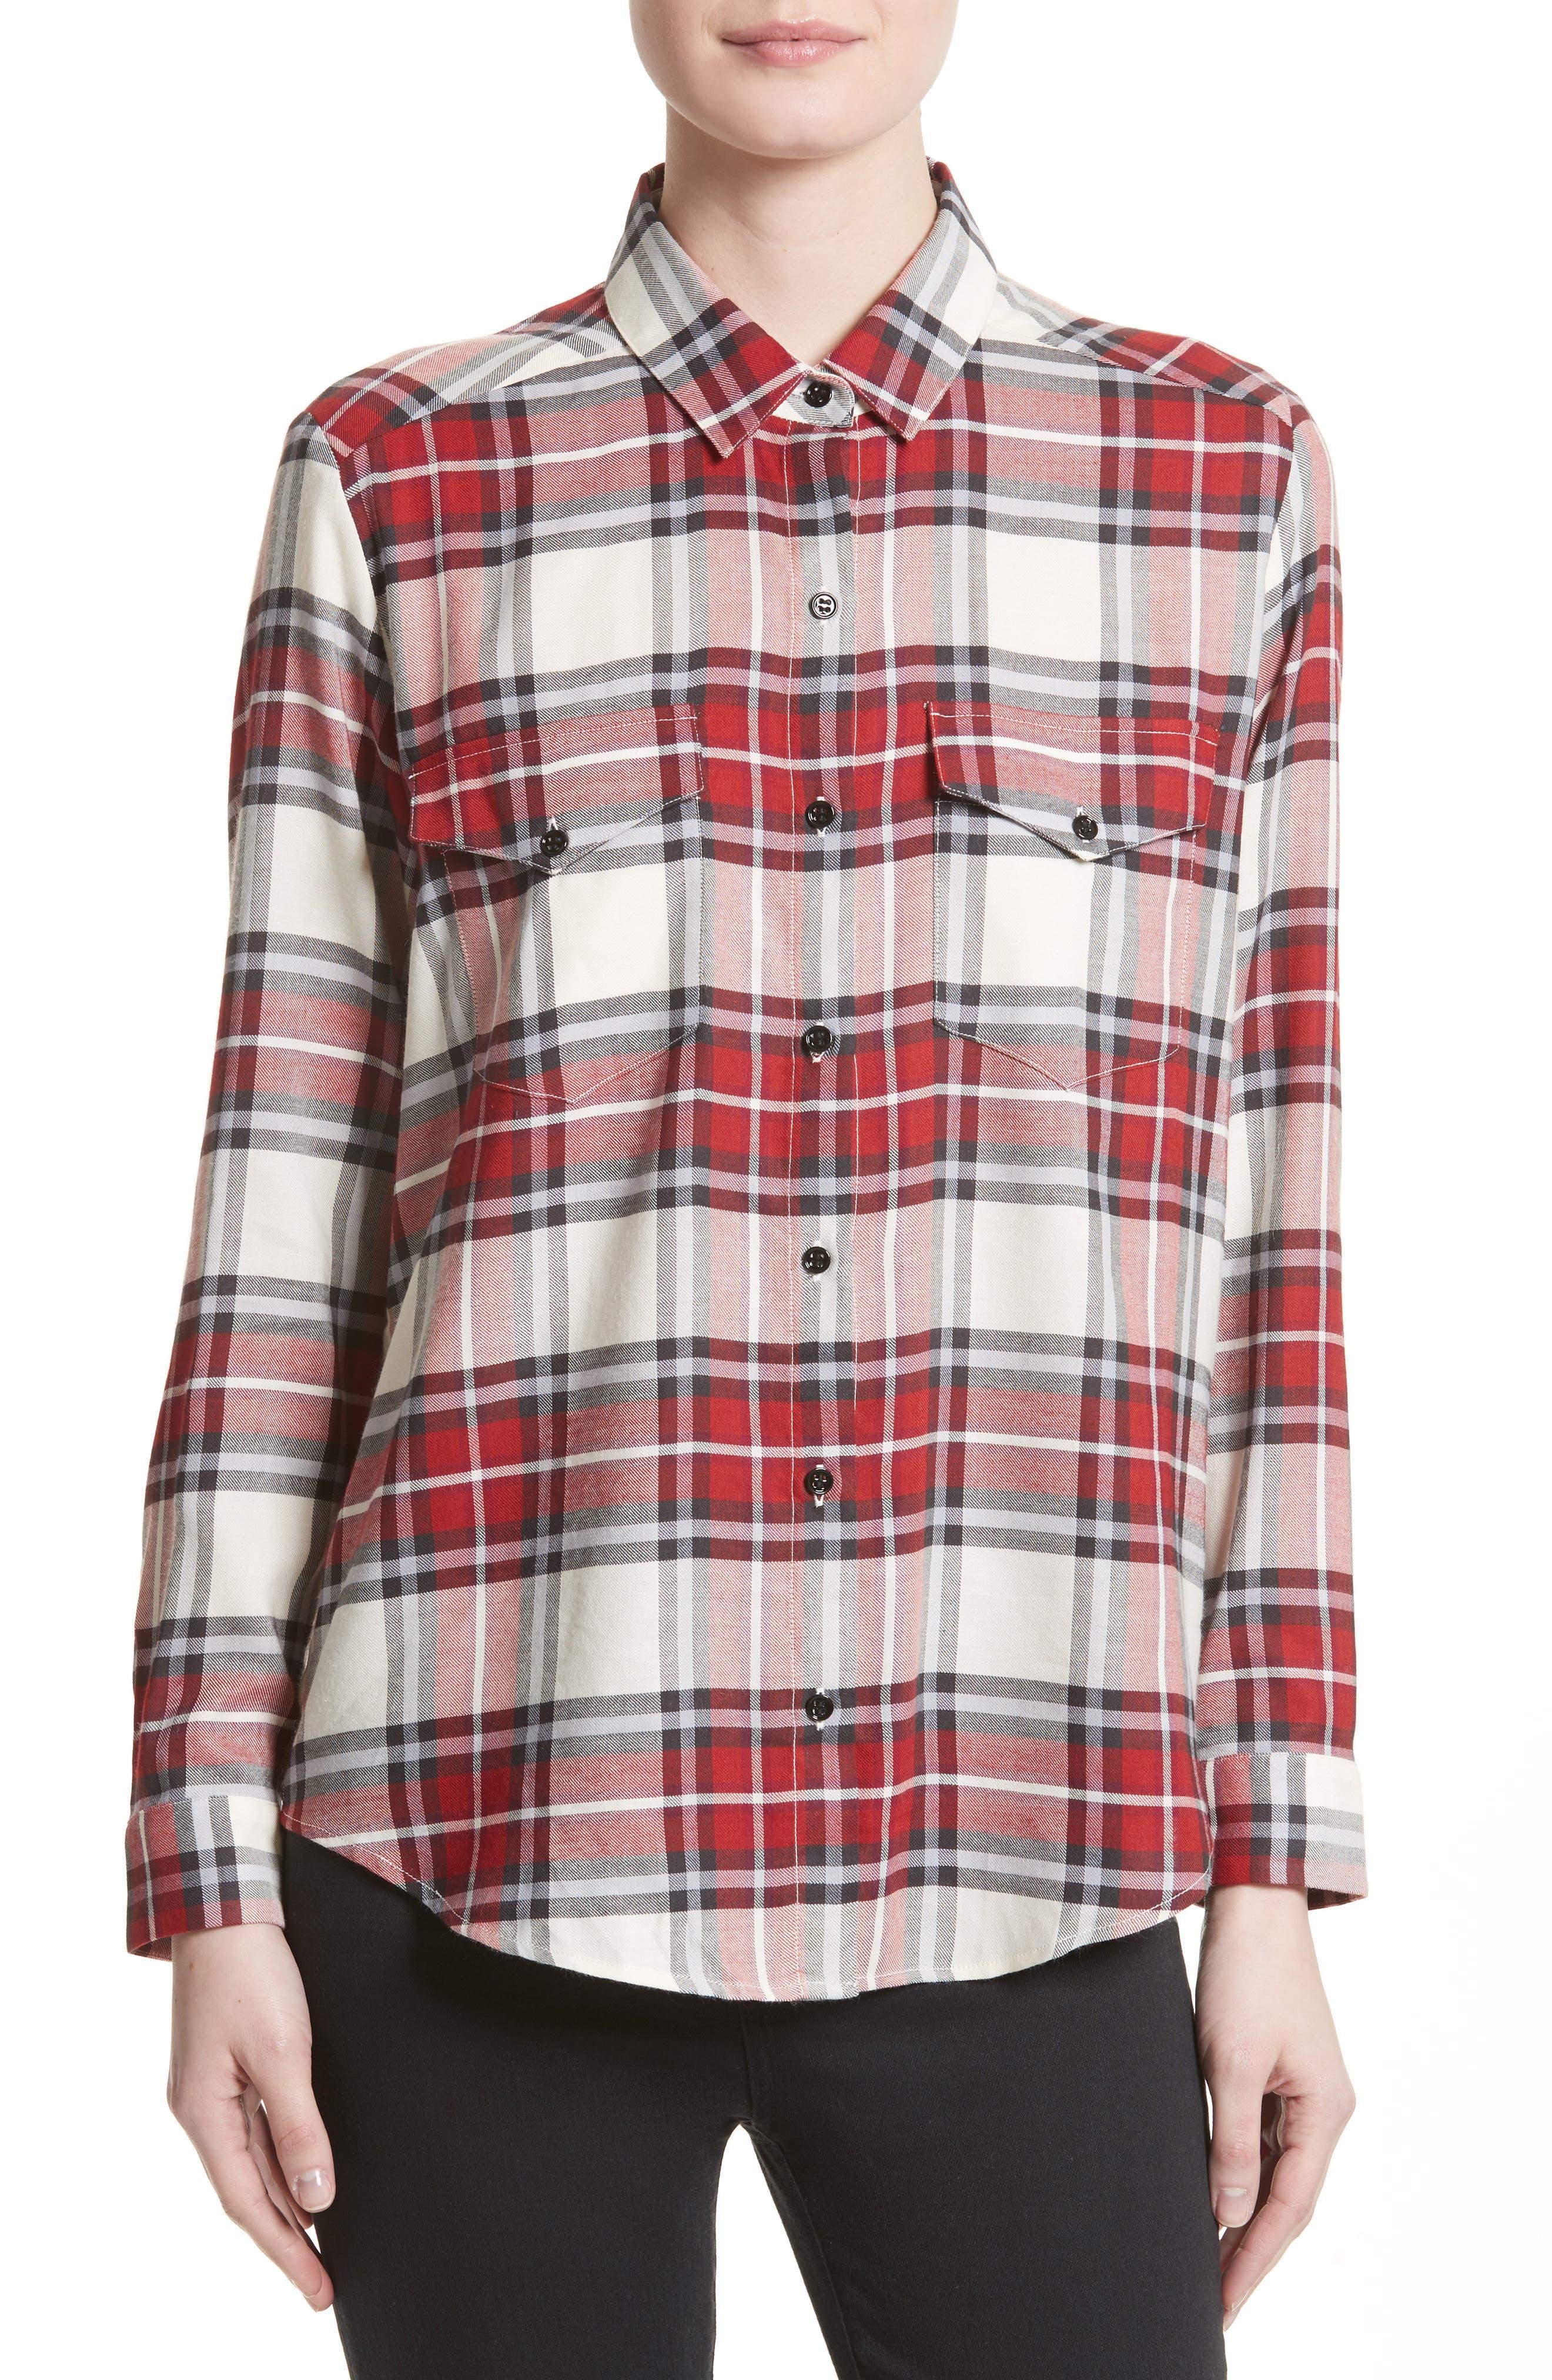 Main Image - The Kooples Plaid Flannel Shirt